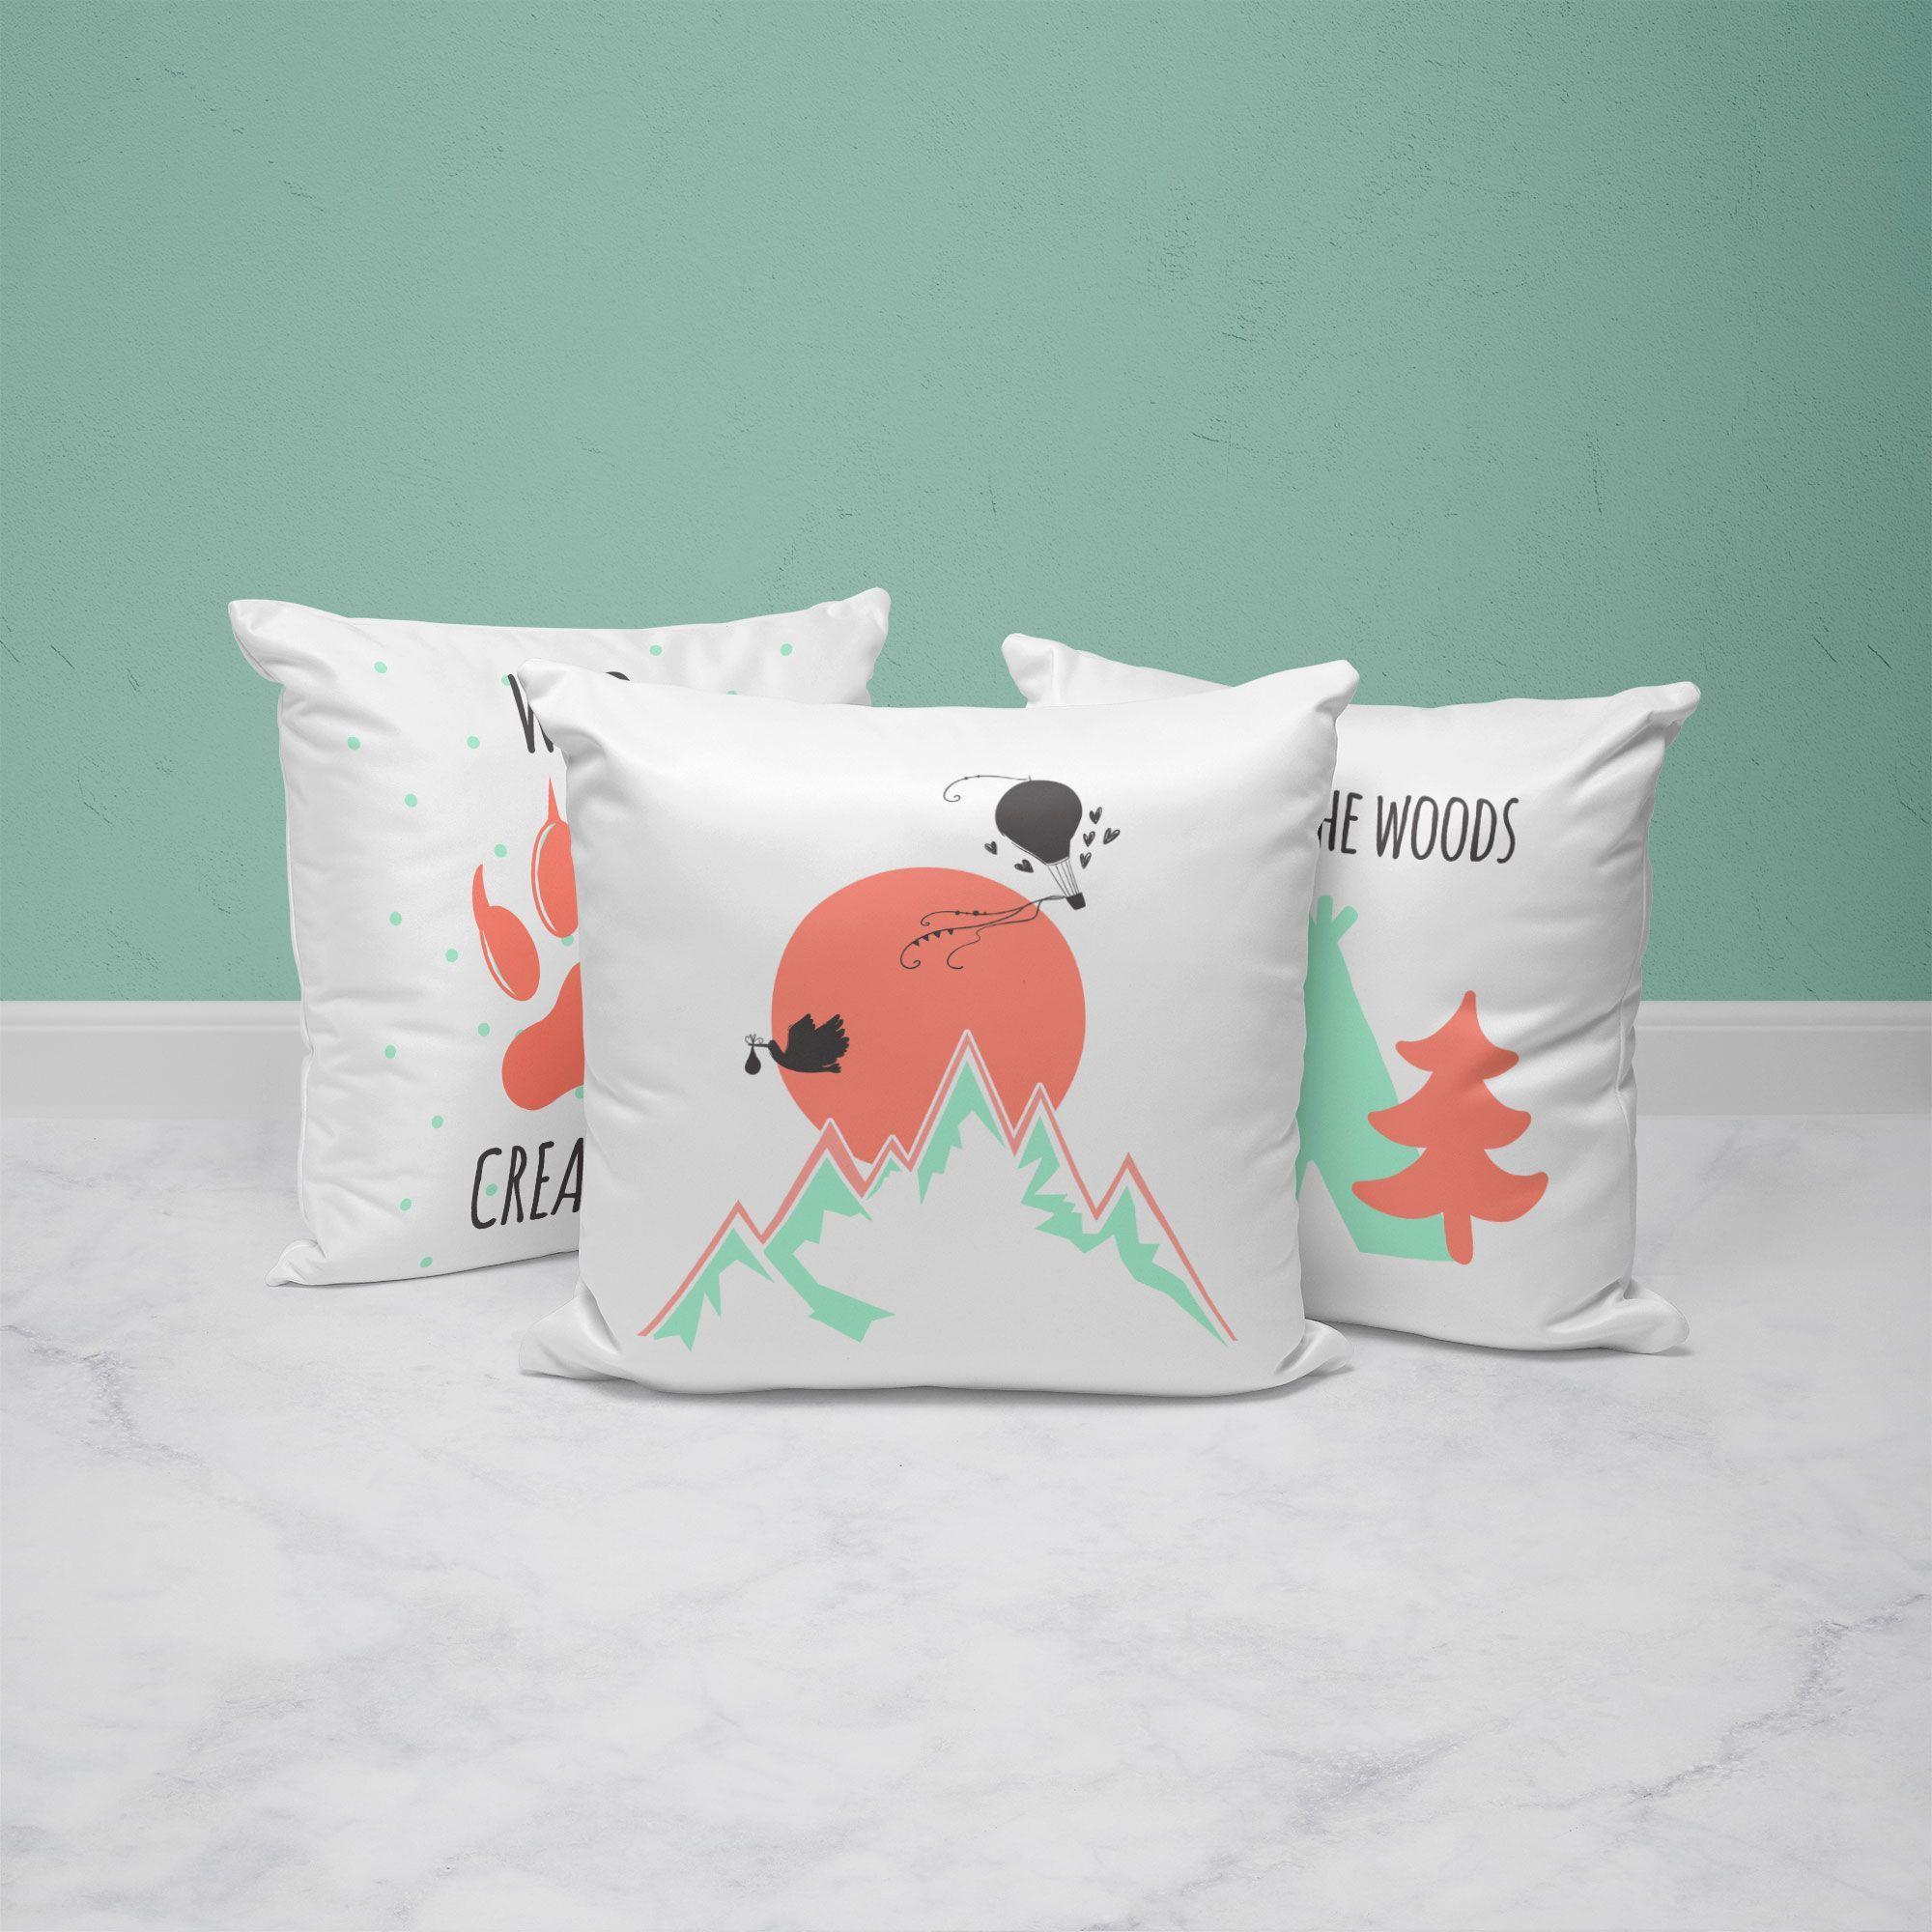 Wild Creature Kids Throw Pillow Set In 2020 Kids Pillows Throw